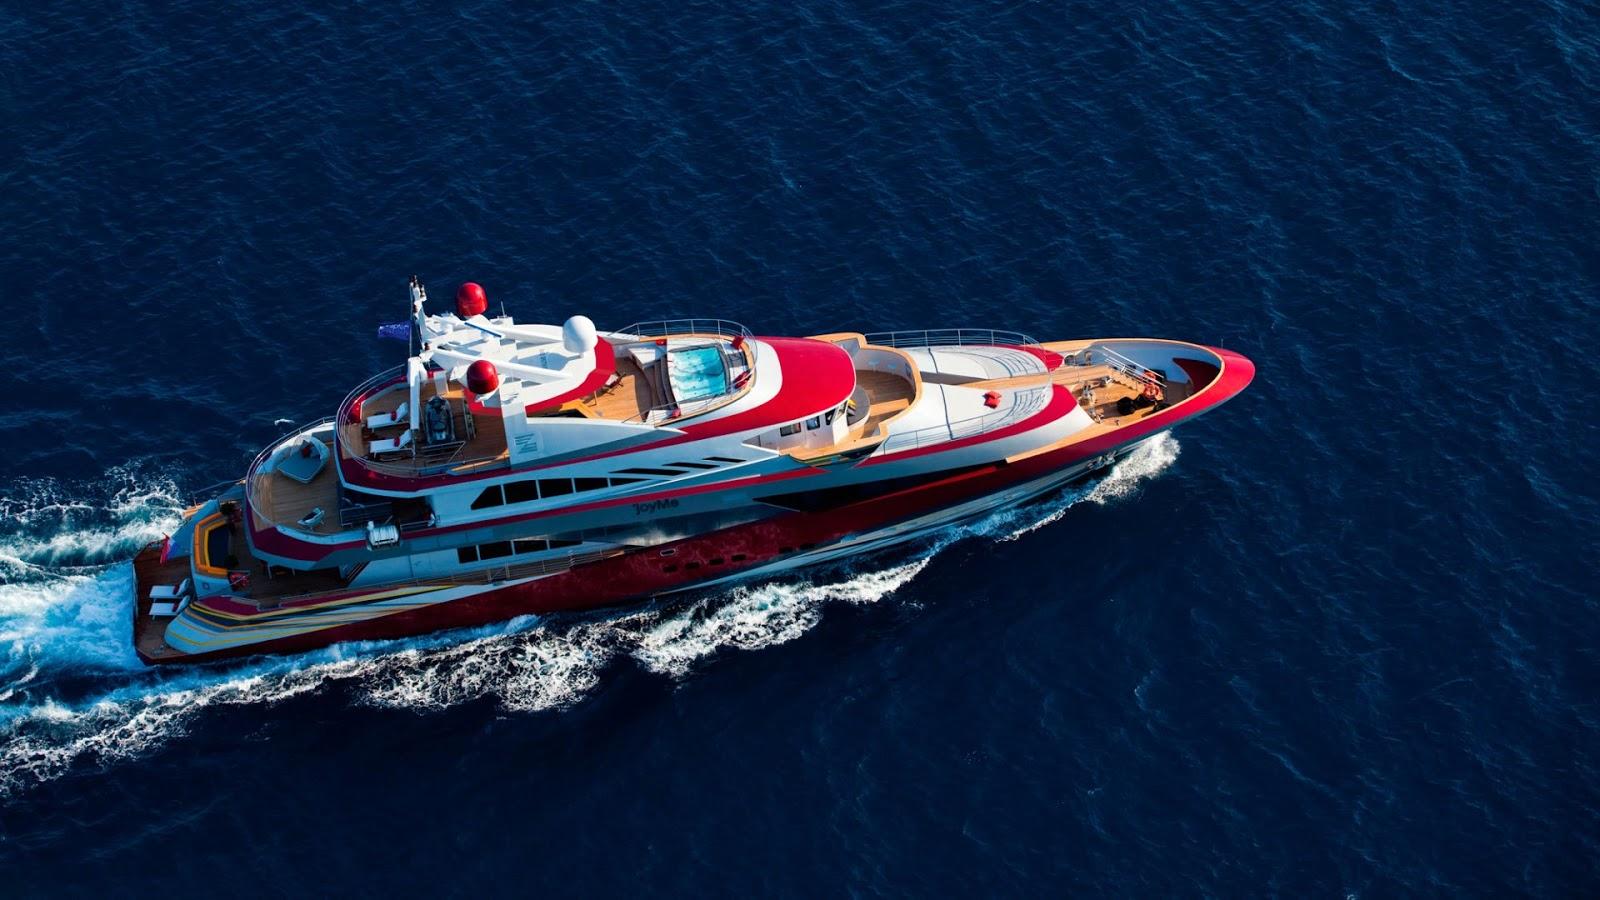 alquiler de yates en ibiza. alquiler barcos ibiza. alquiler de barcos en ibiza. alquiler barcos ibiza. alquilar yates en ibiza. barcos de alquiler en ibiza